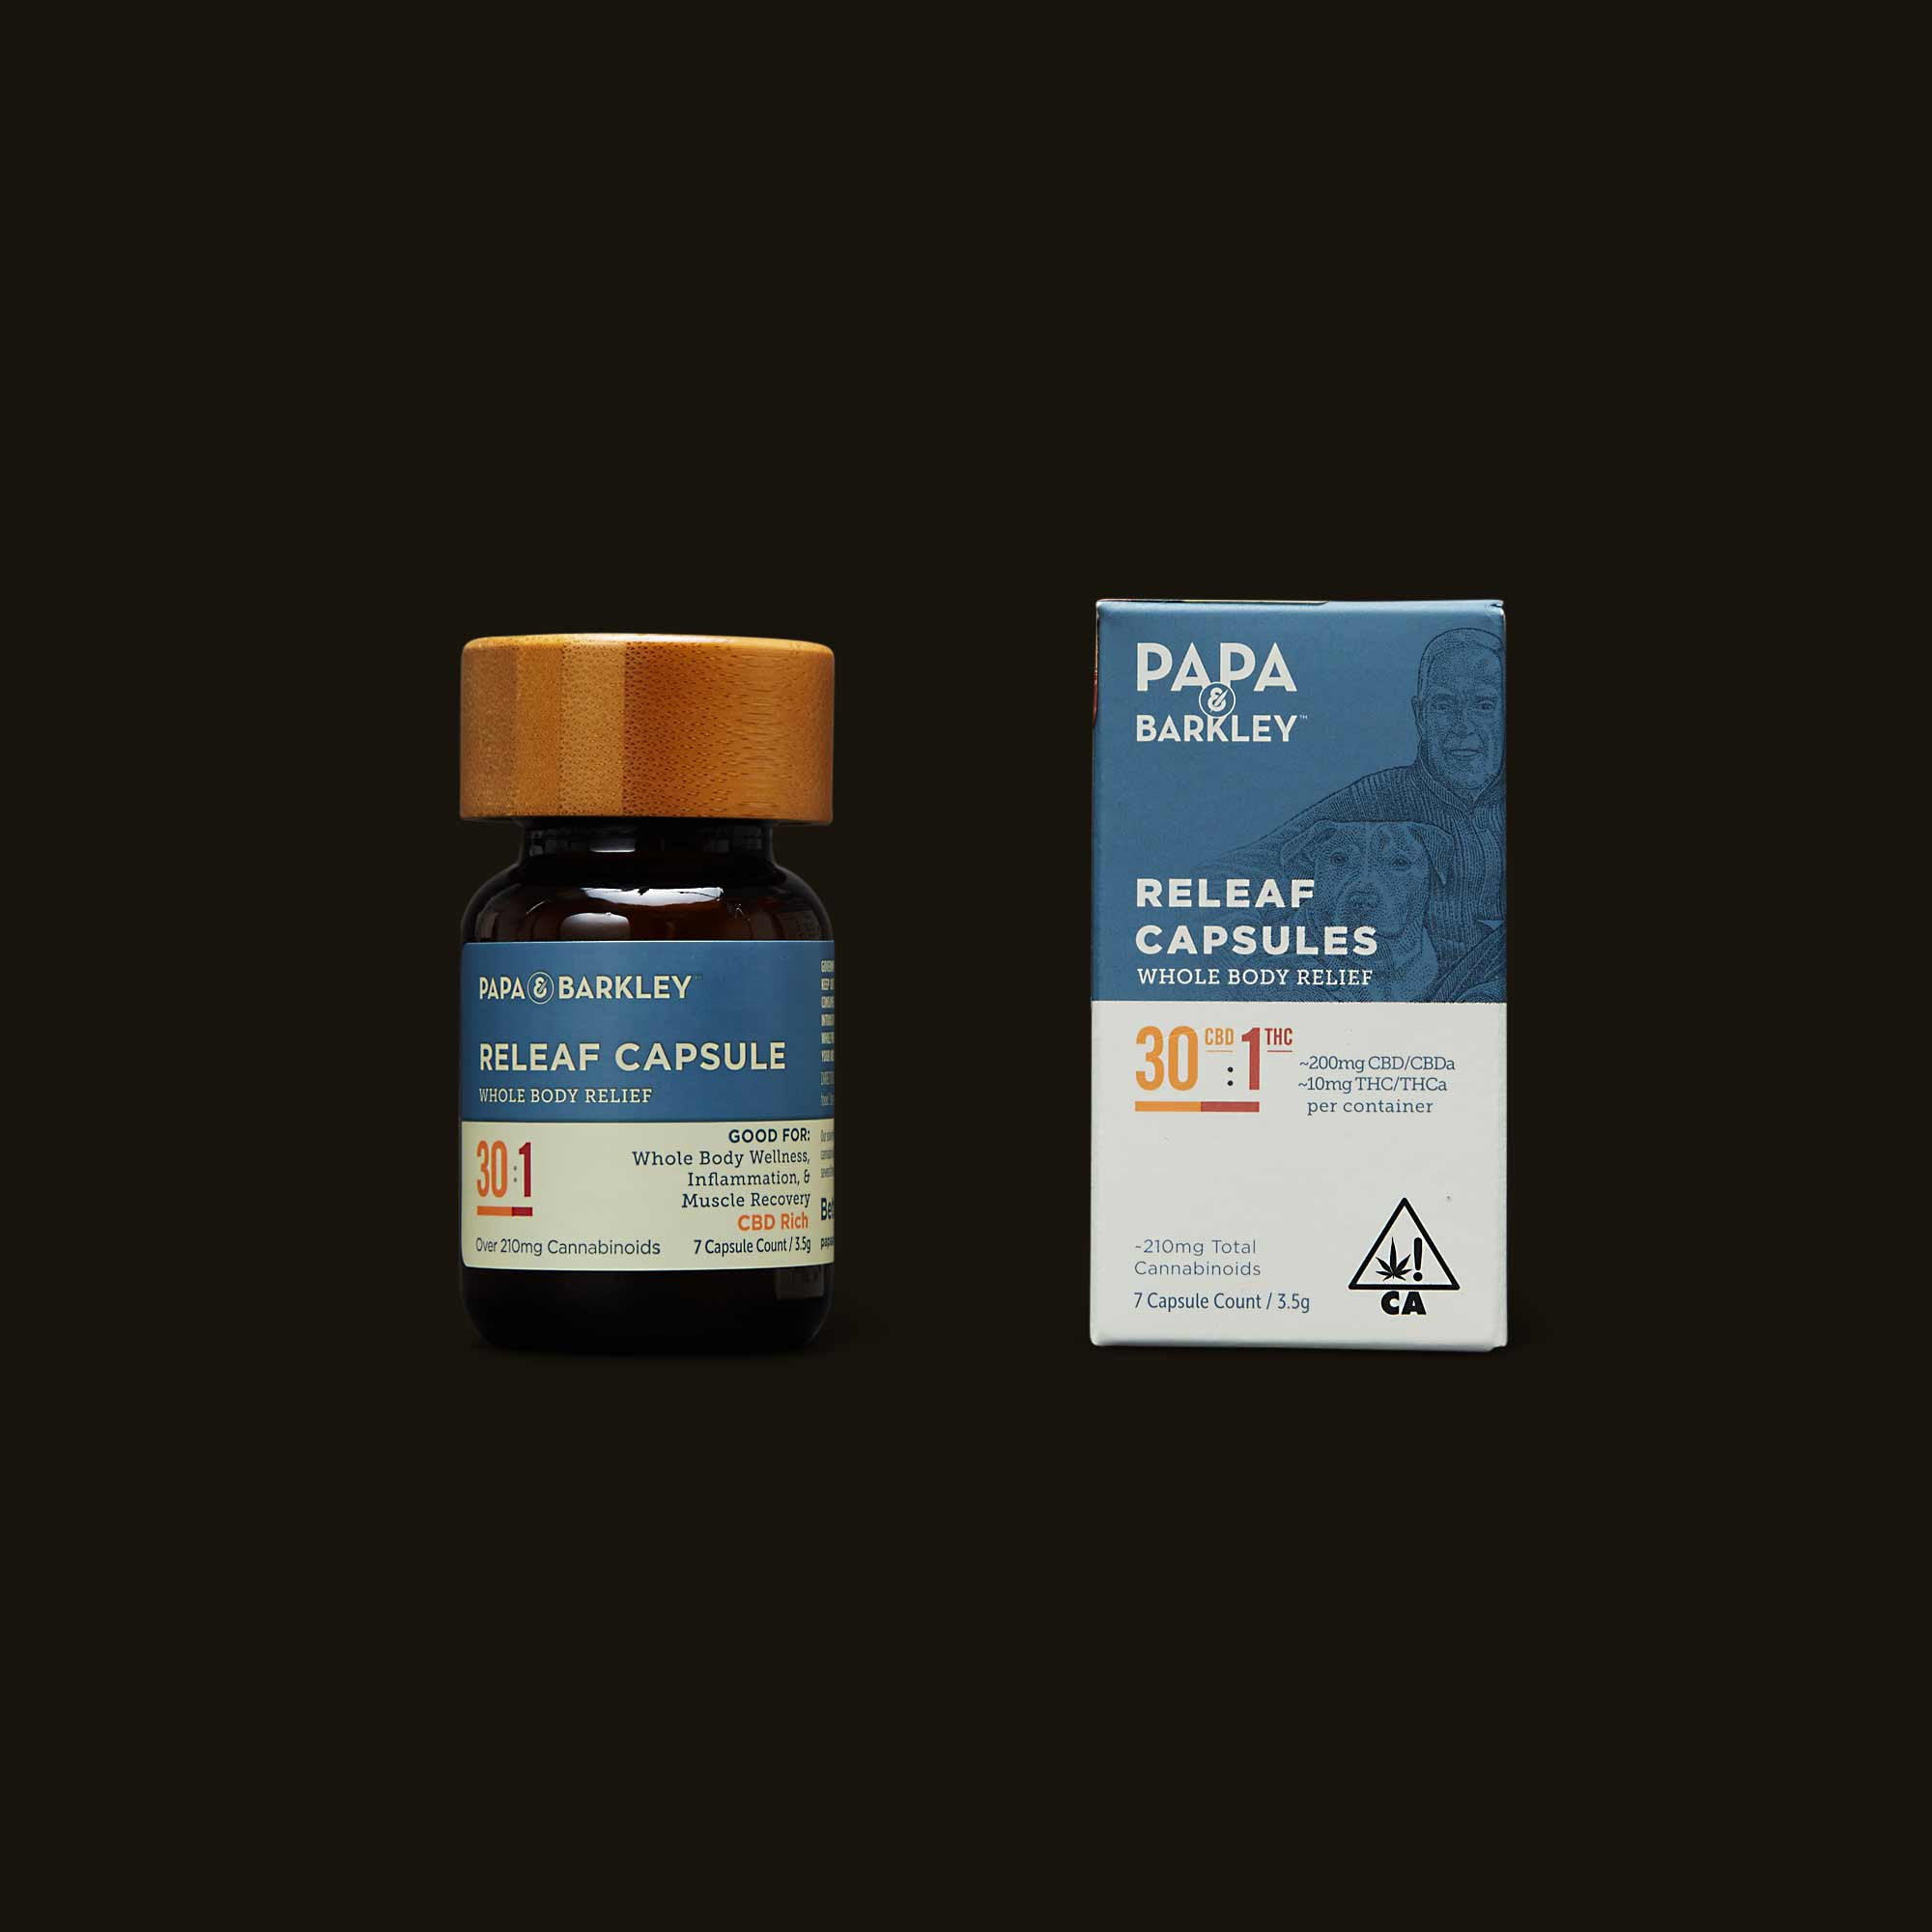 Papa & Barkley 30:1 CBD:THC Releaf Capsule